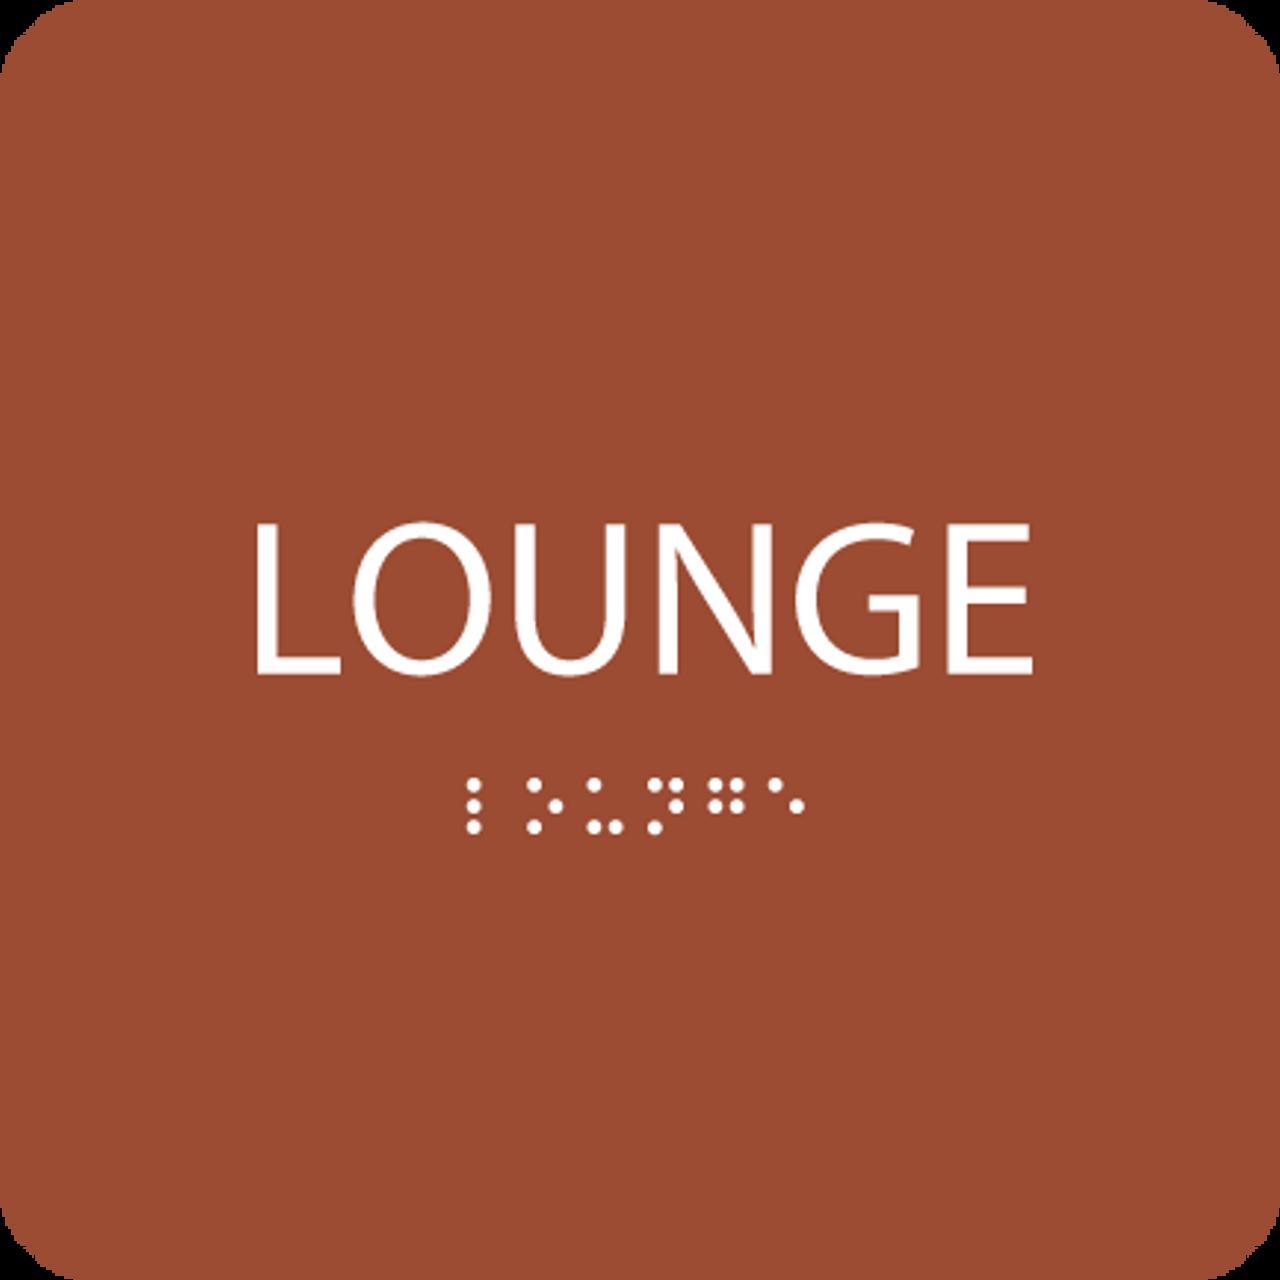 Orange Lounge ADA Sign